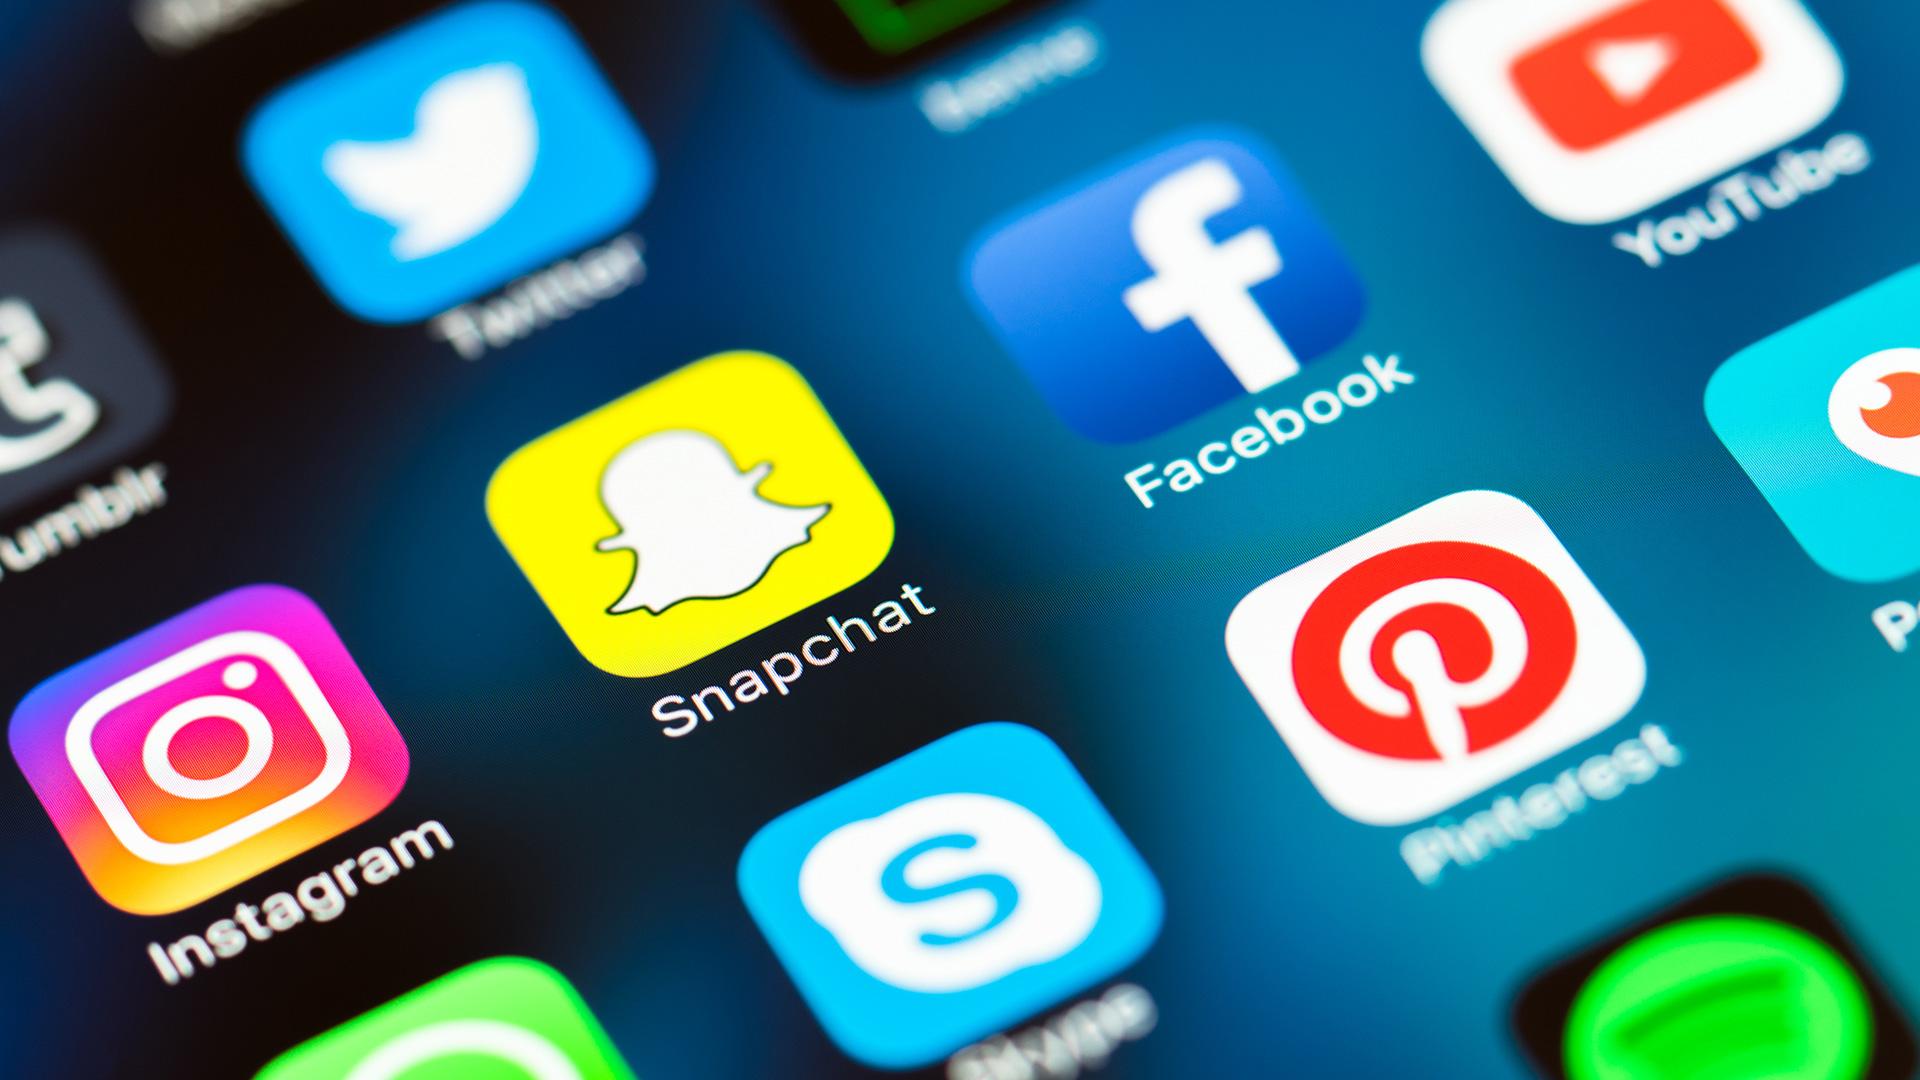 Perlu Tingkatkan Kewaspadaan di Media Sosial untuk Melawan Radikalisme